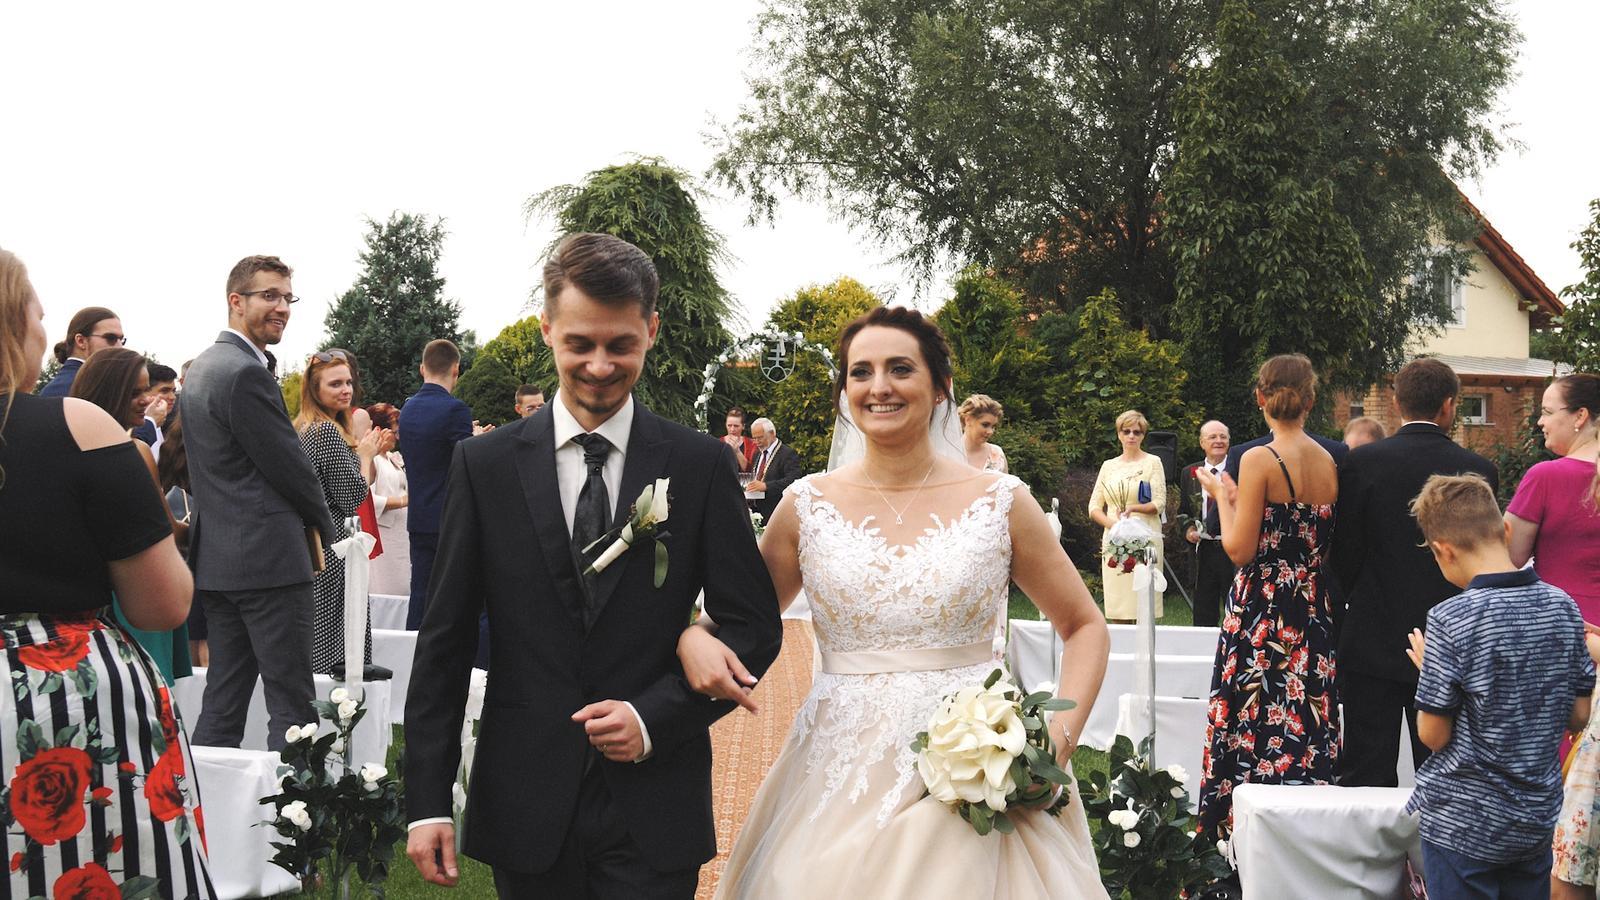 Svadba Matúša a Vierky - Obrázok č. 3